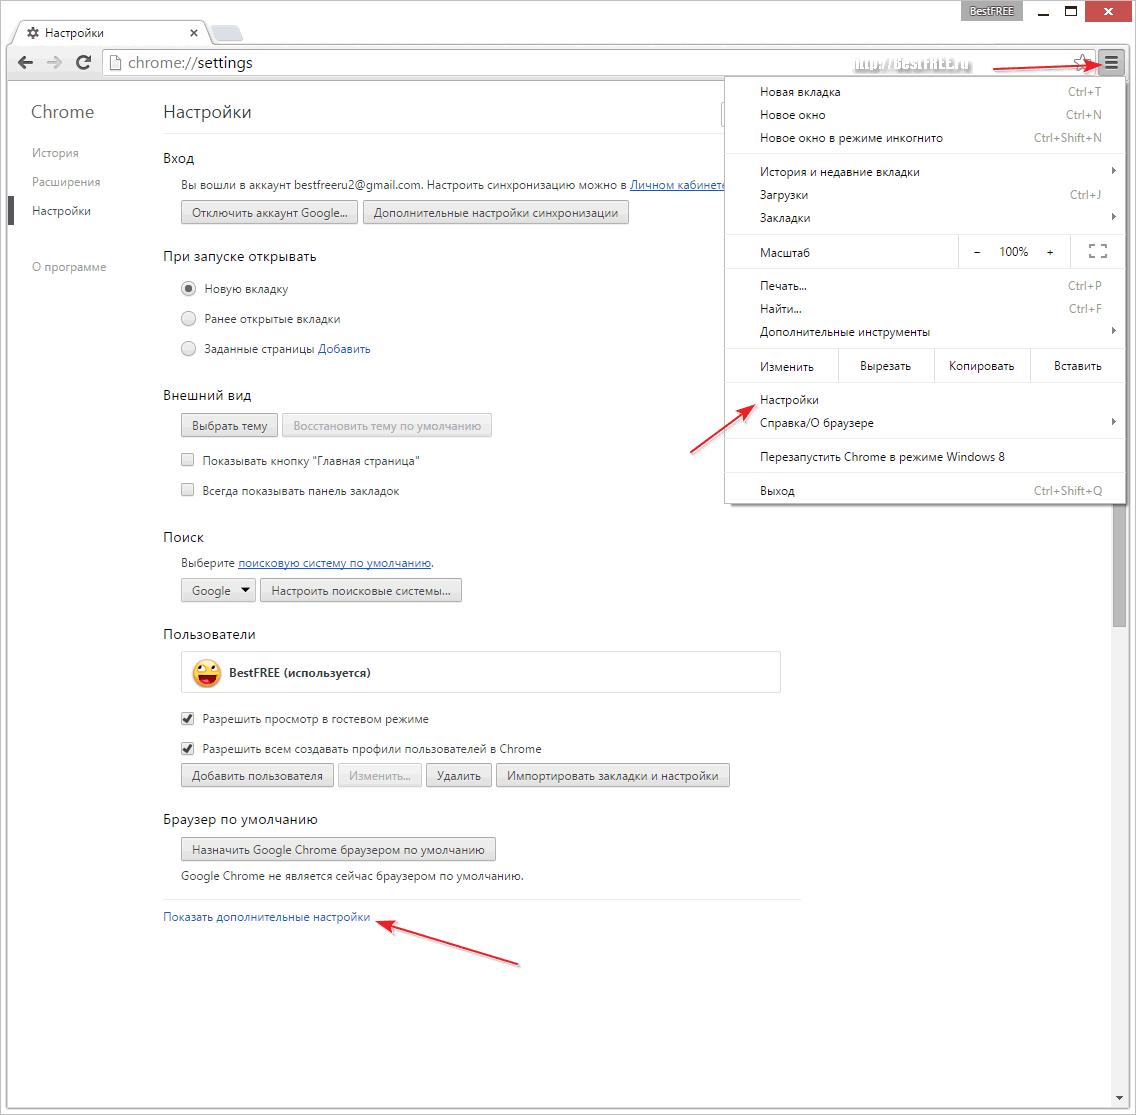 Как назначить Chrome браузером по умолчанию - Android. - Google Chrome 95